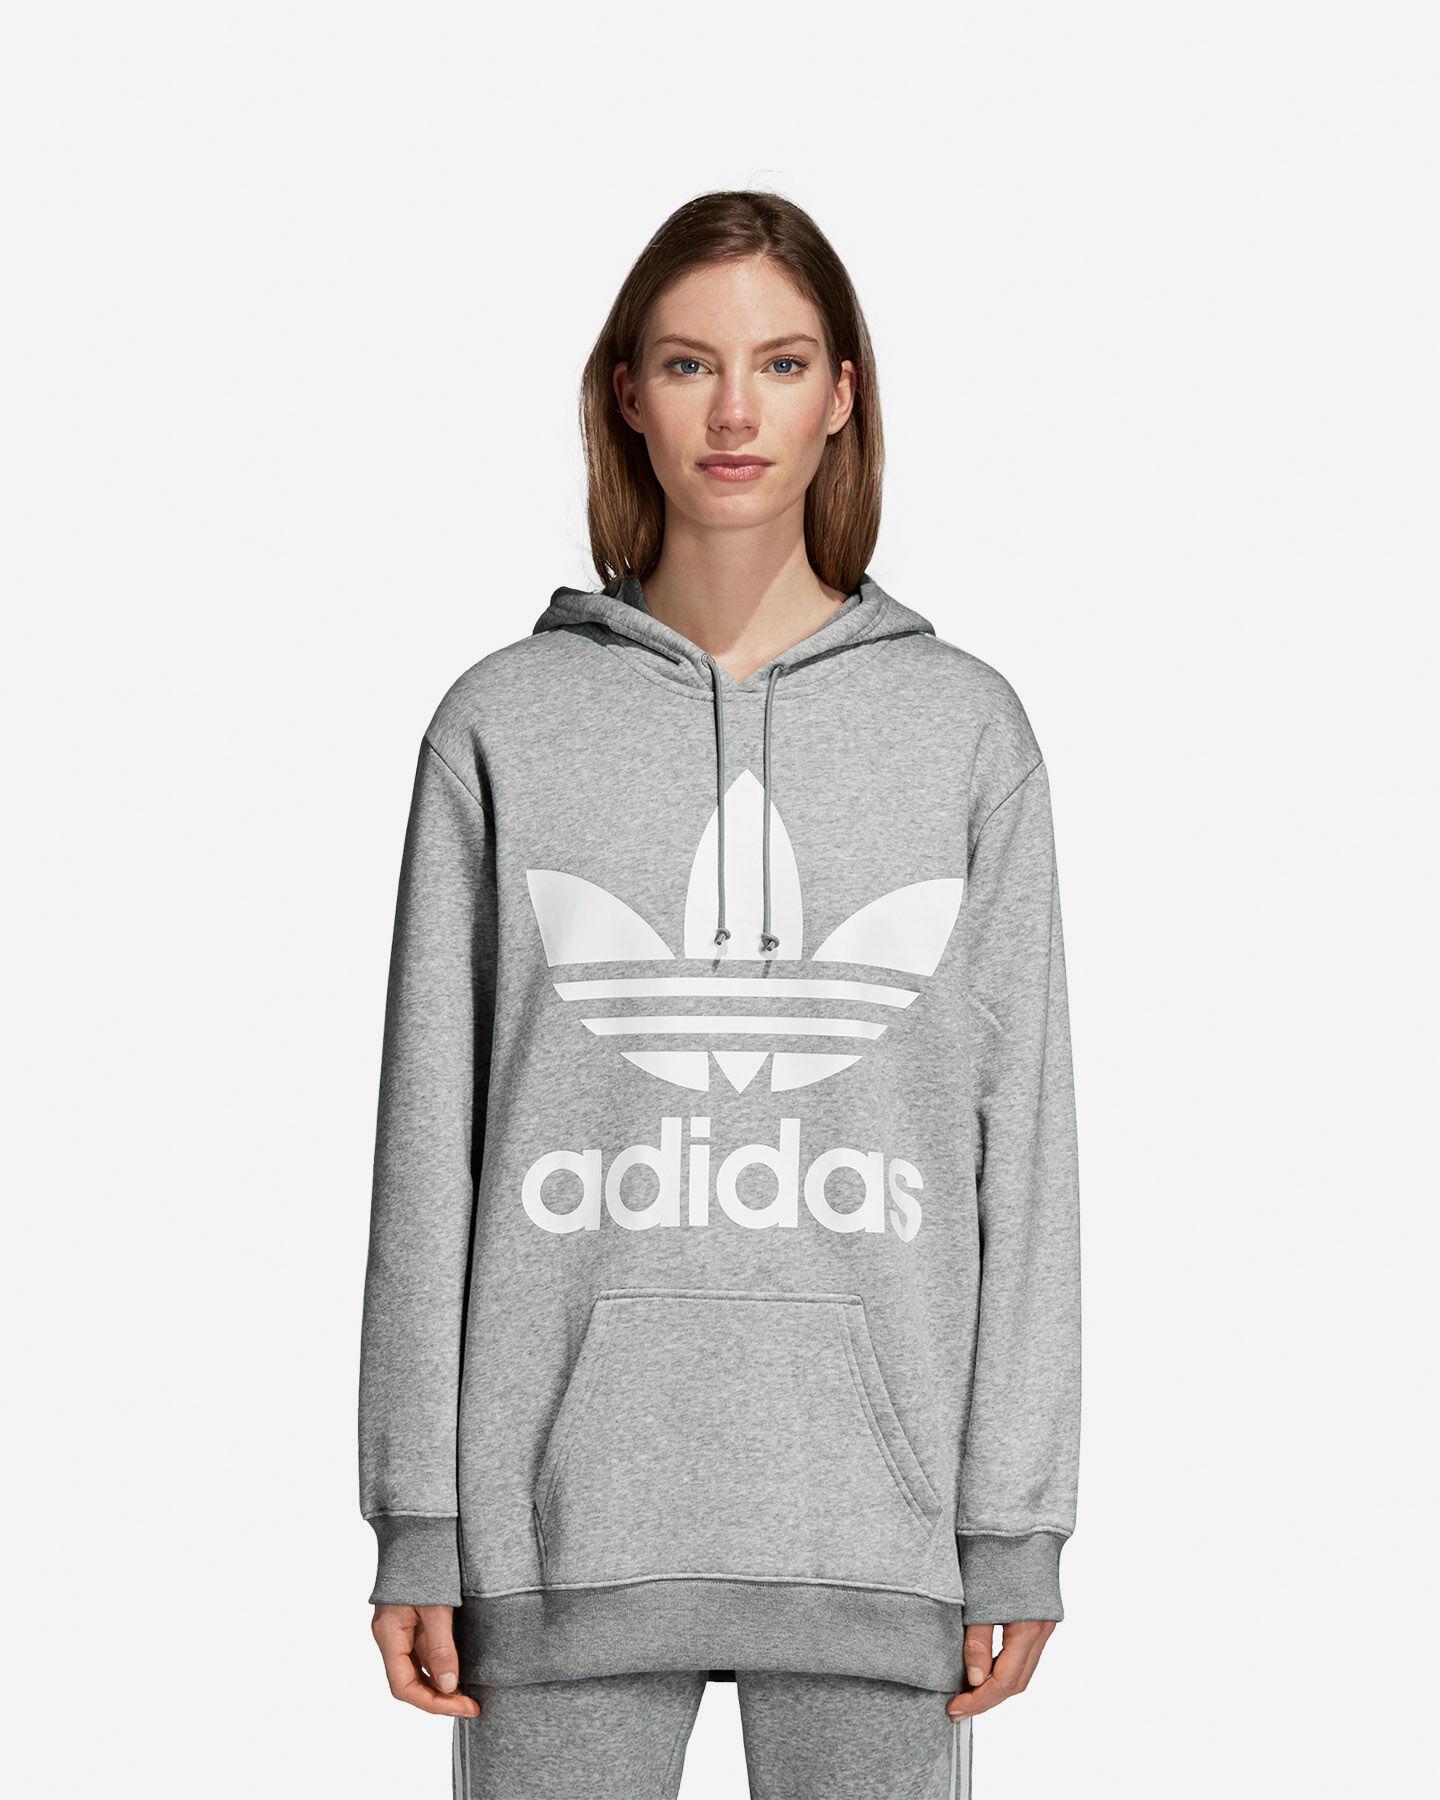 felpa adidas oversize donna